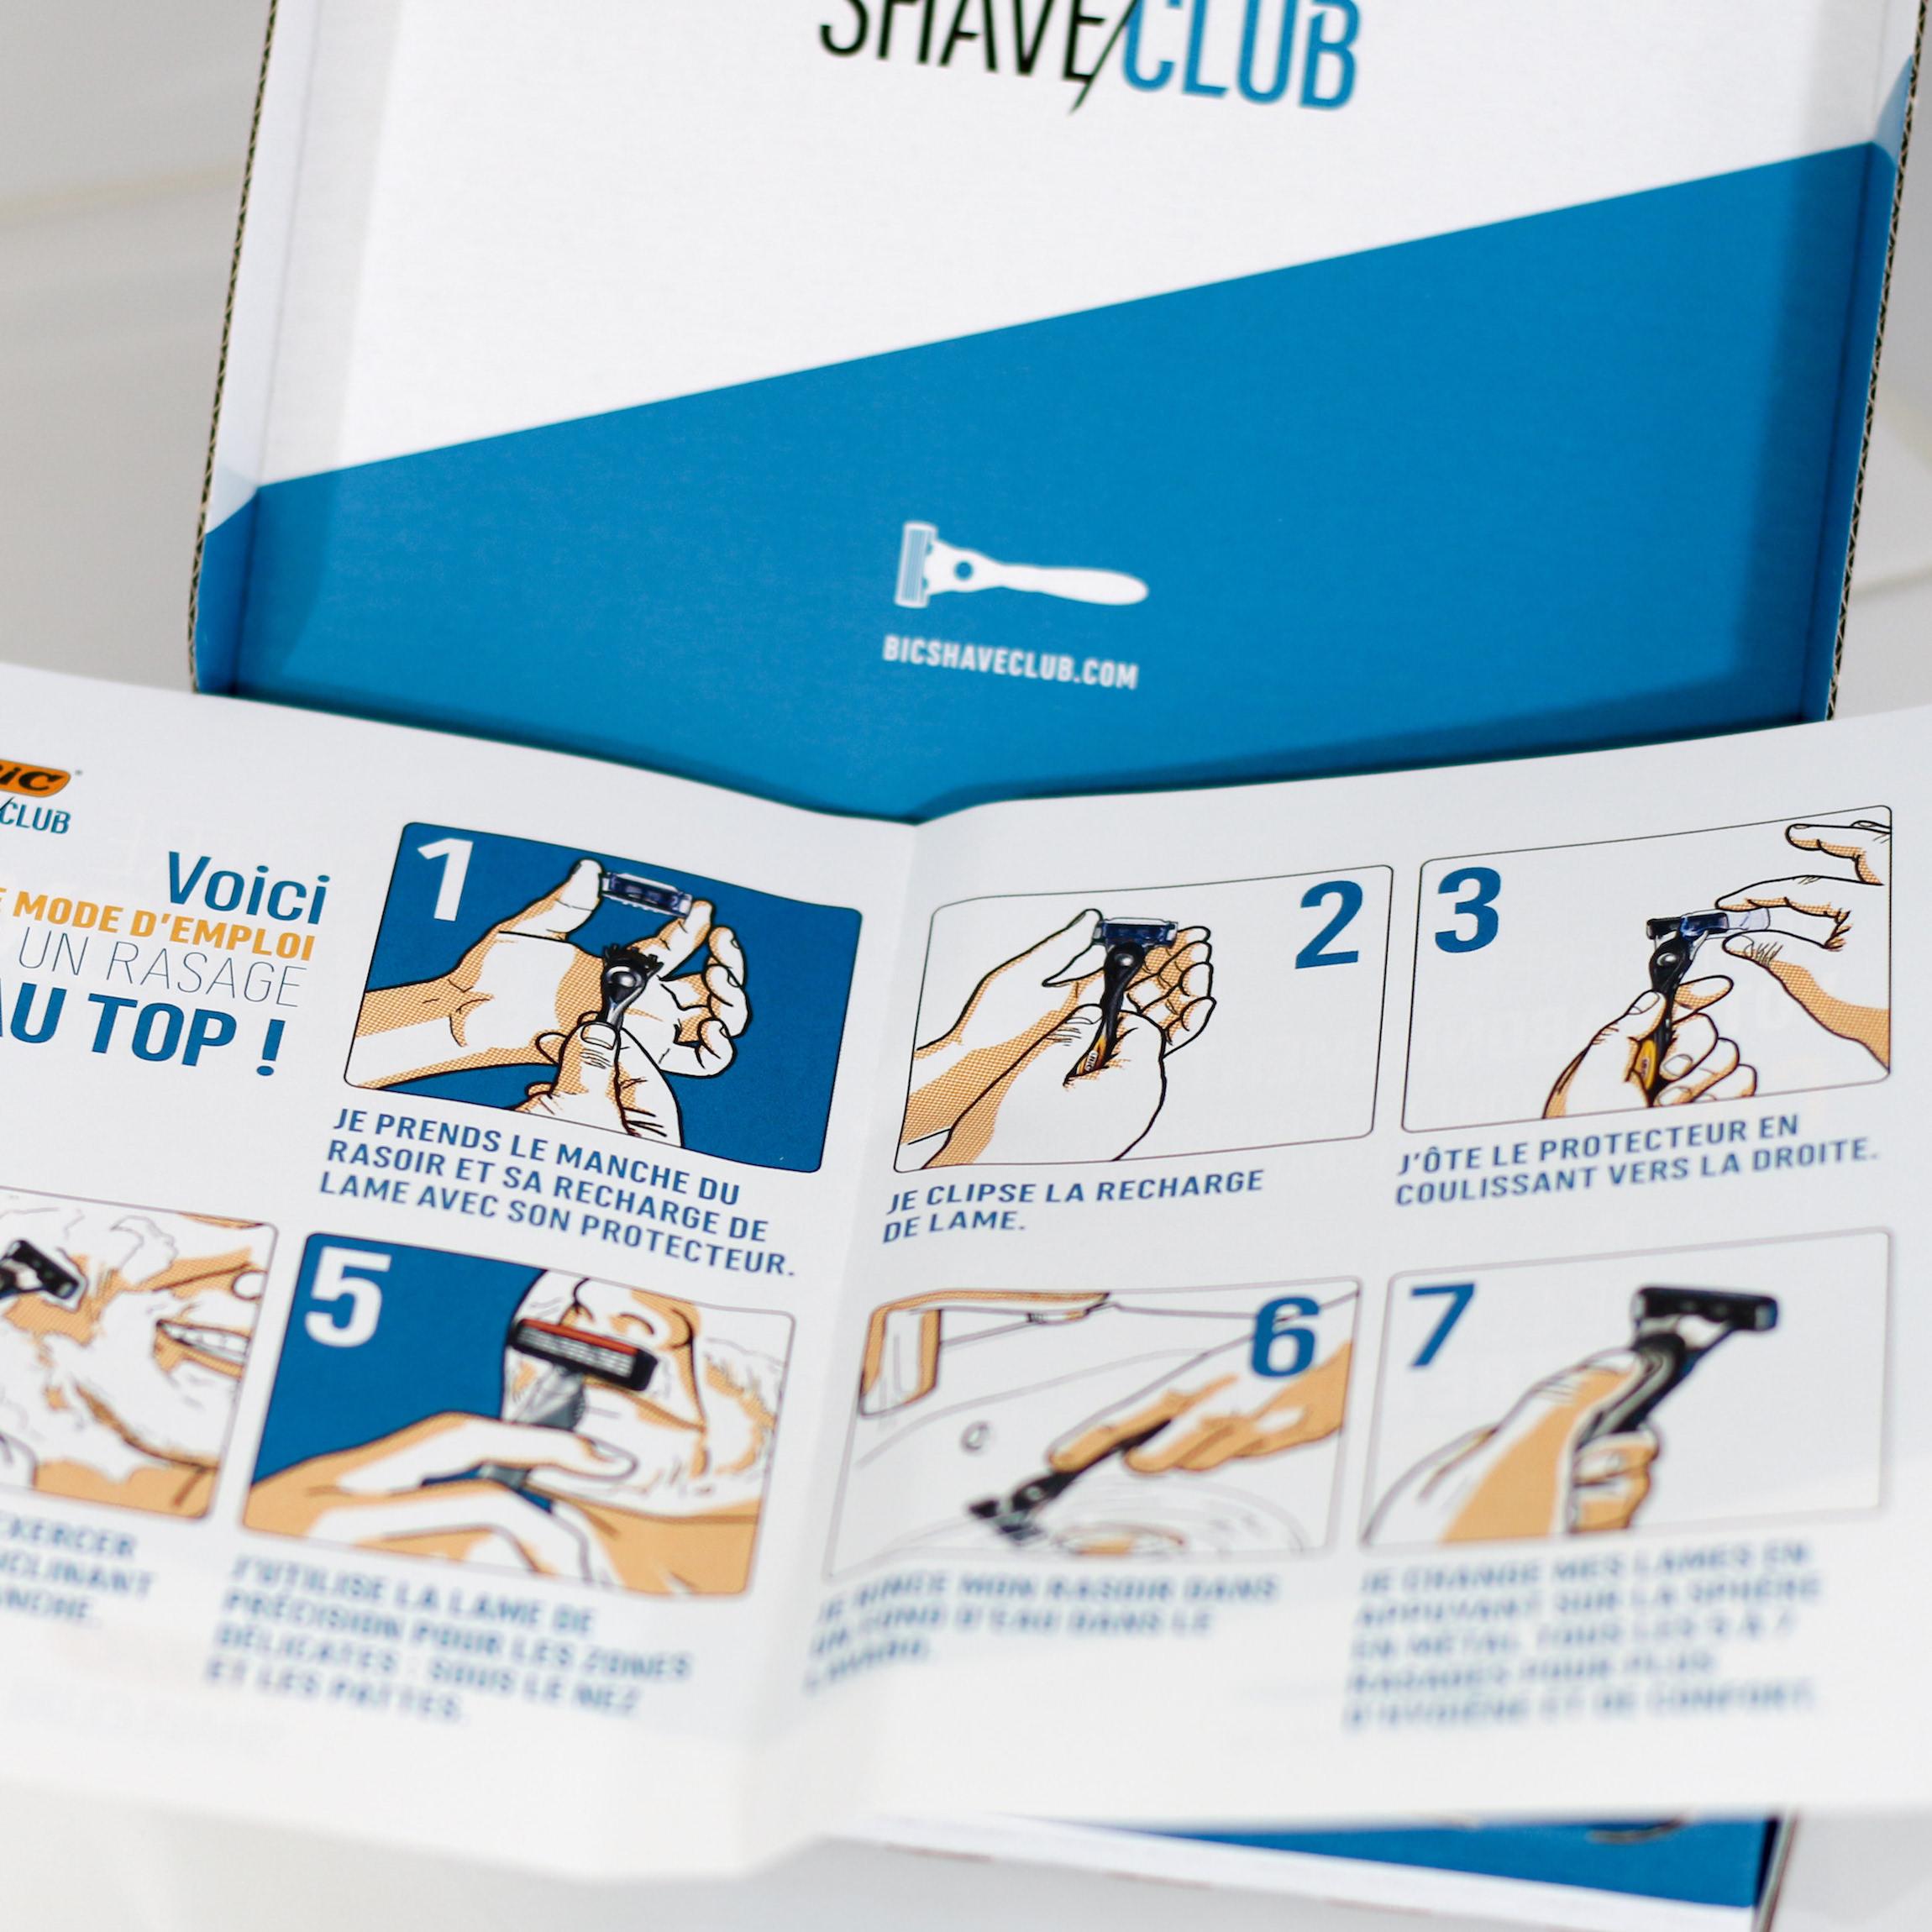 bic shave club box